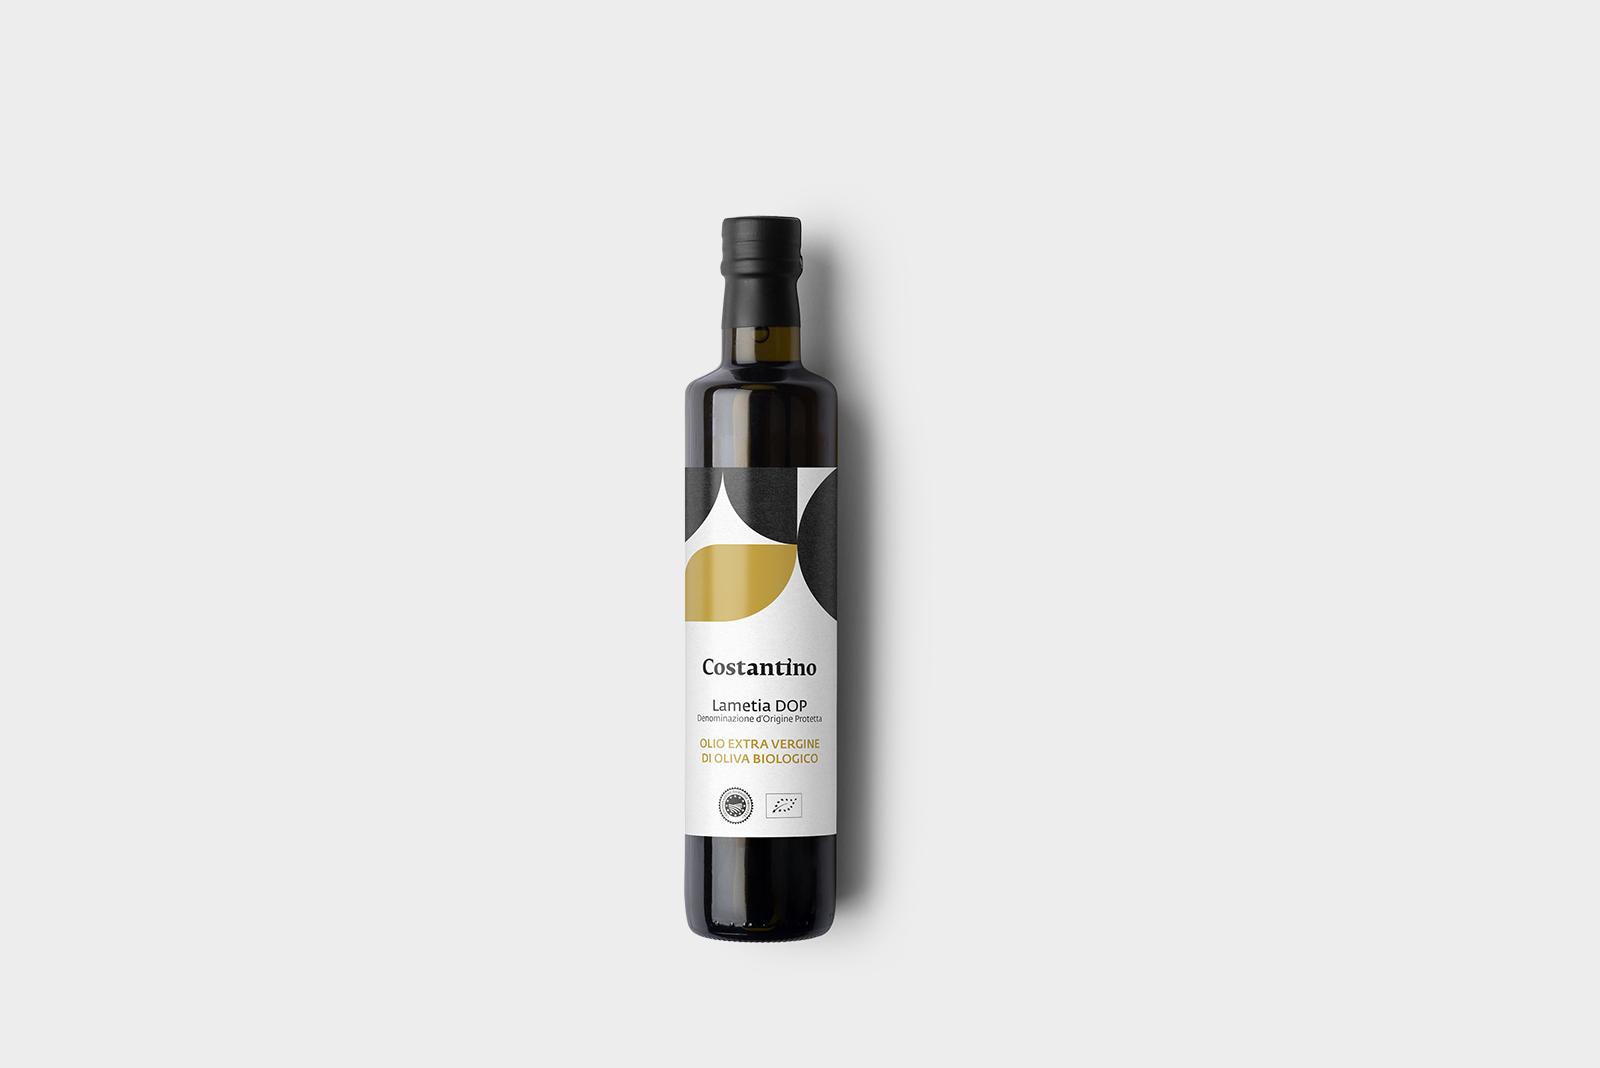 Costantino - Olio Extra Vergine d'Oliva Biologico Dop Lamezia - bottiglia 25cl